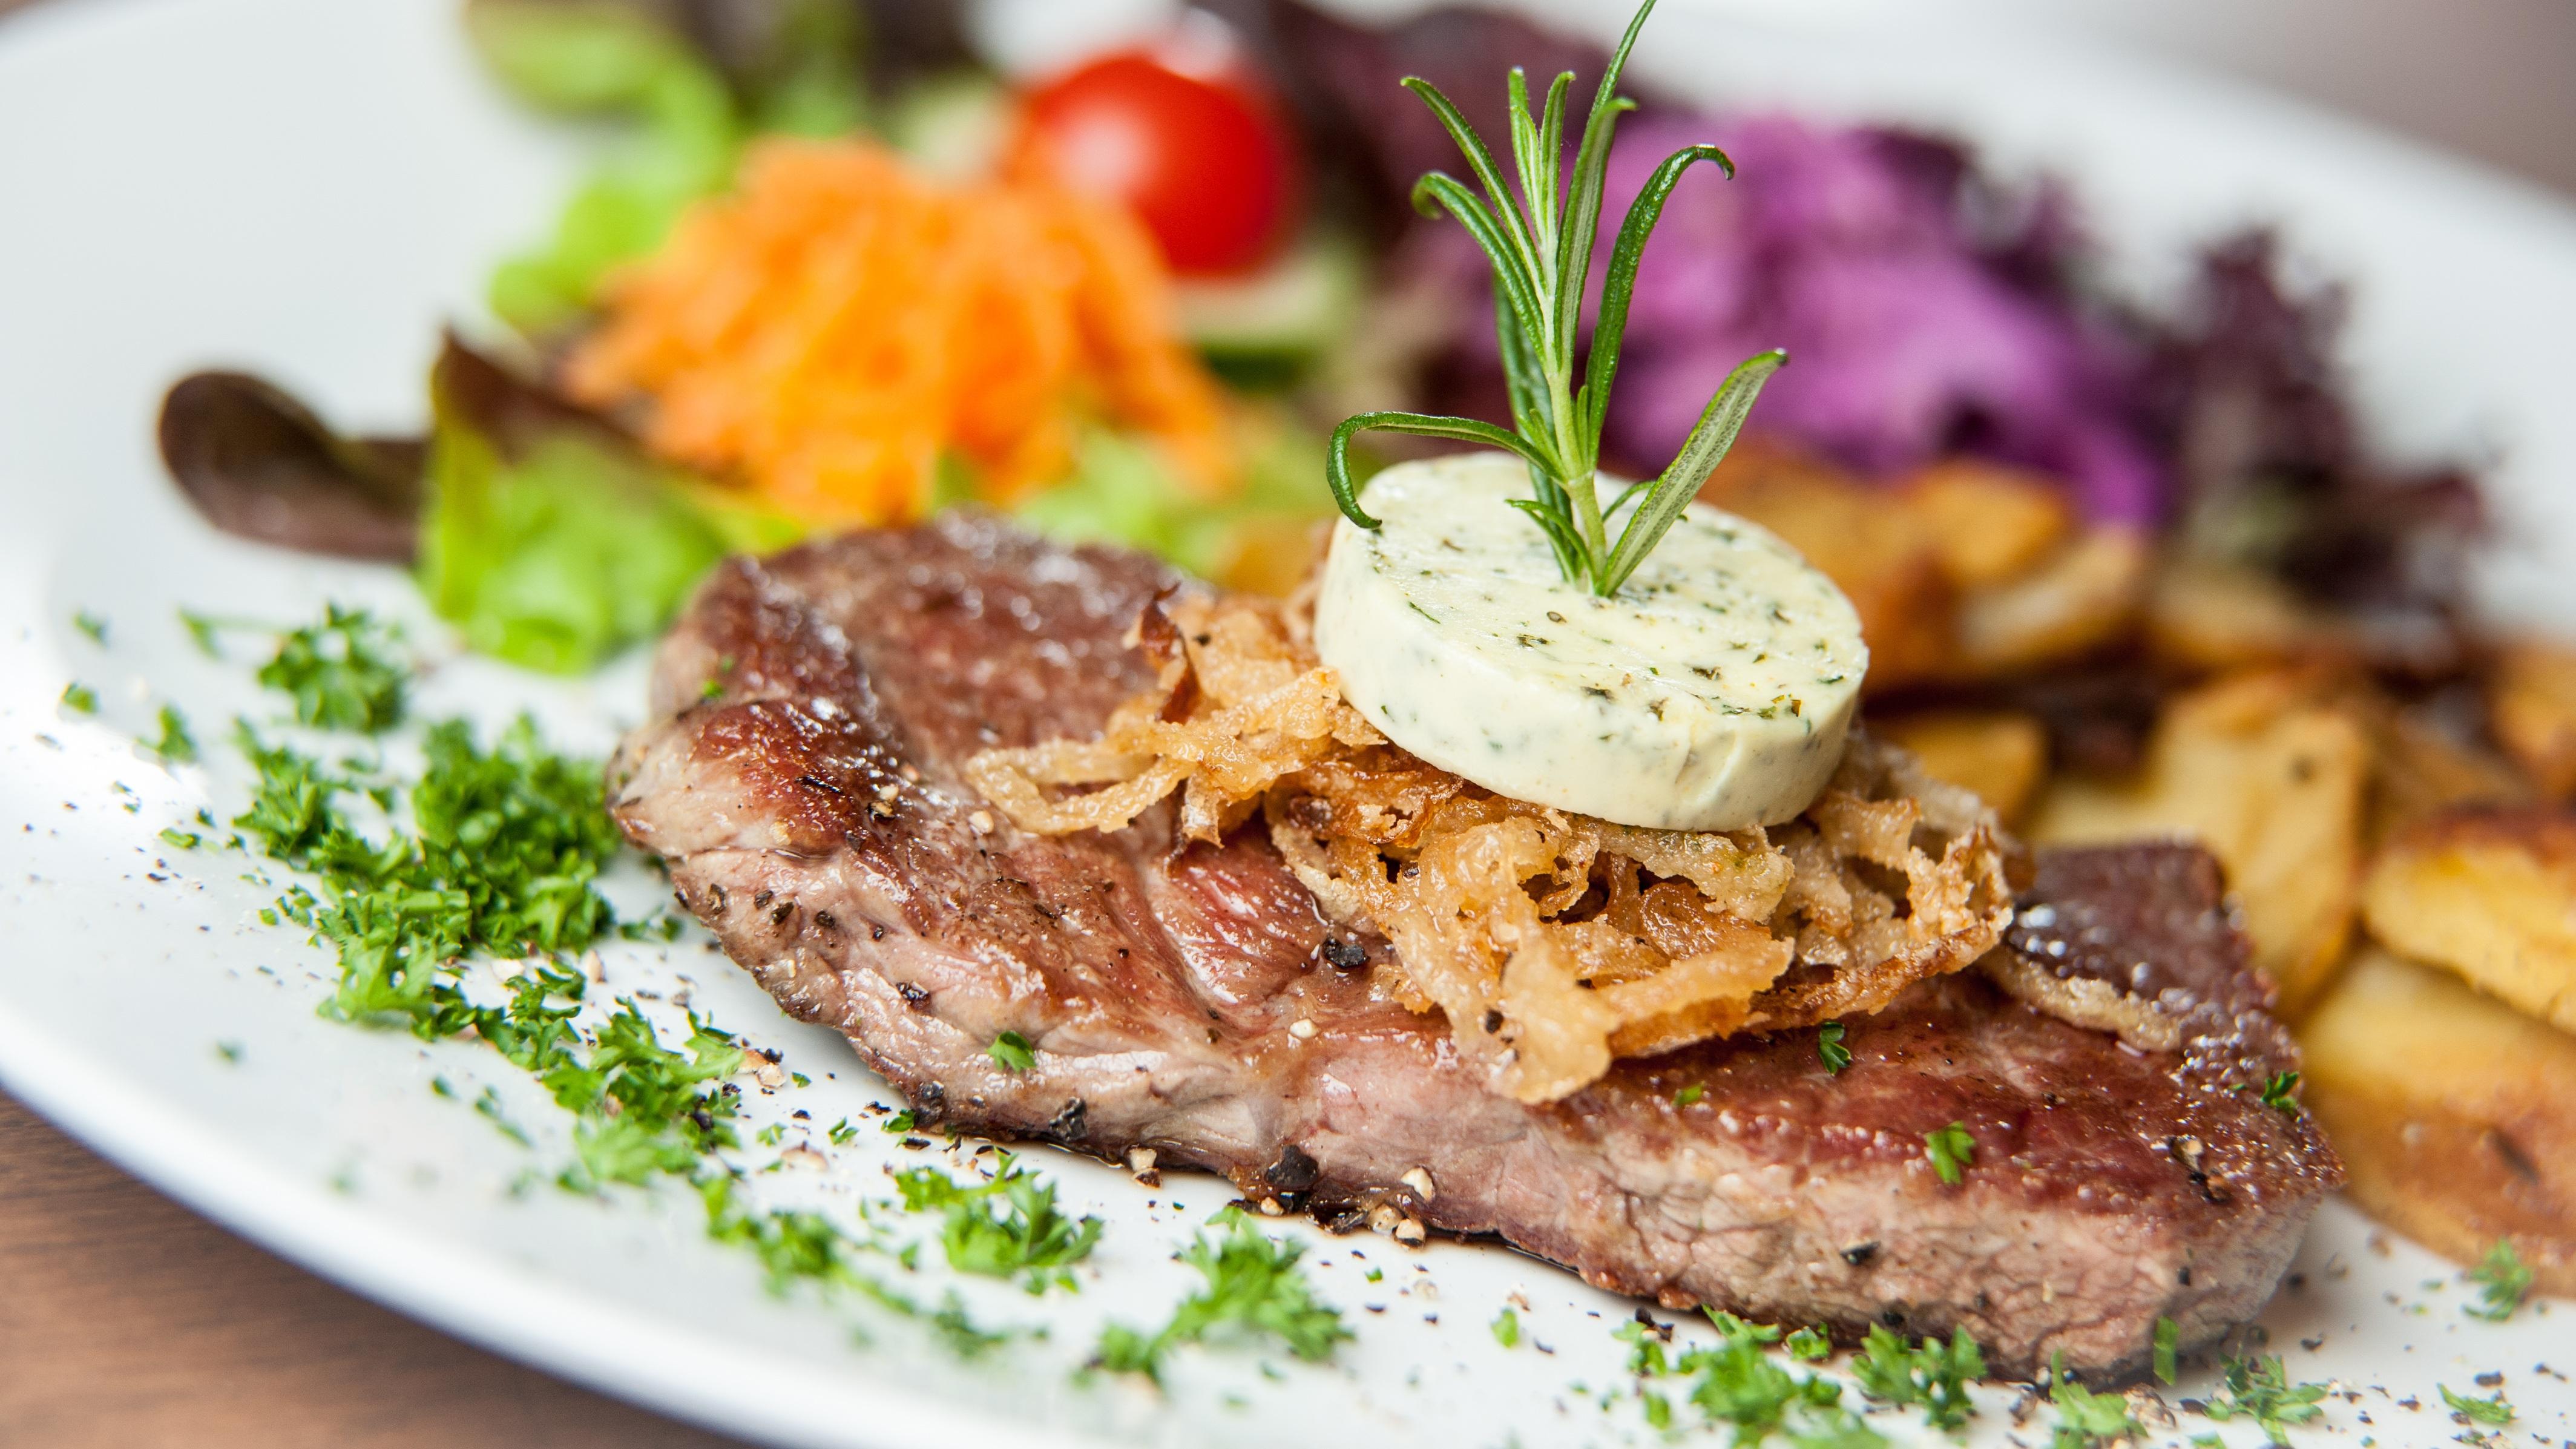 Free Images : restaurant, dish, meal, food, produce, menu ...